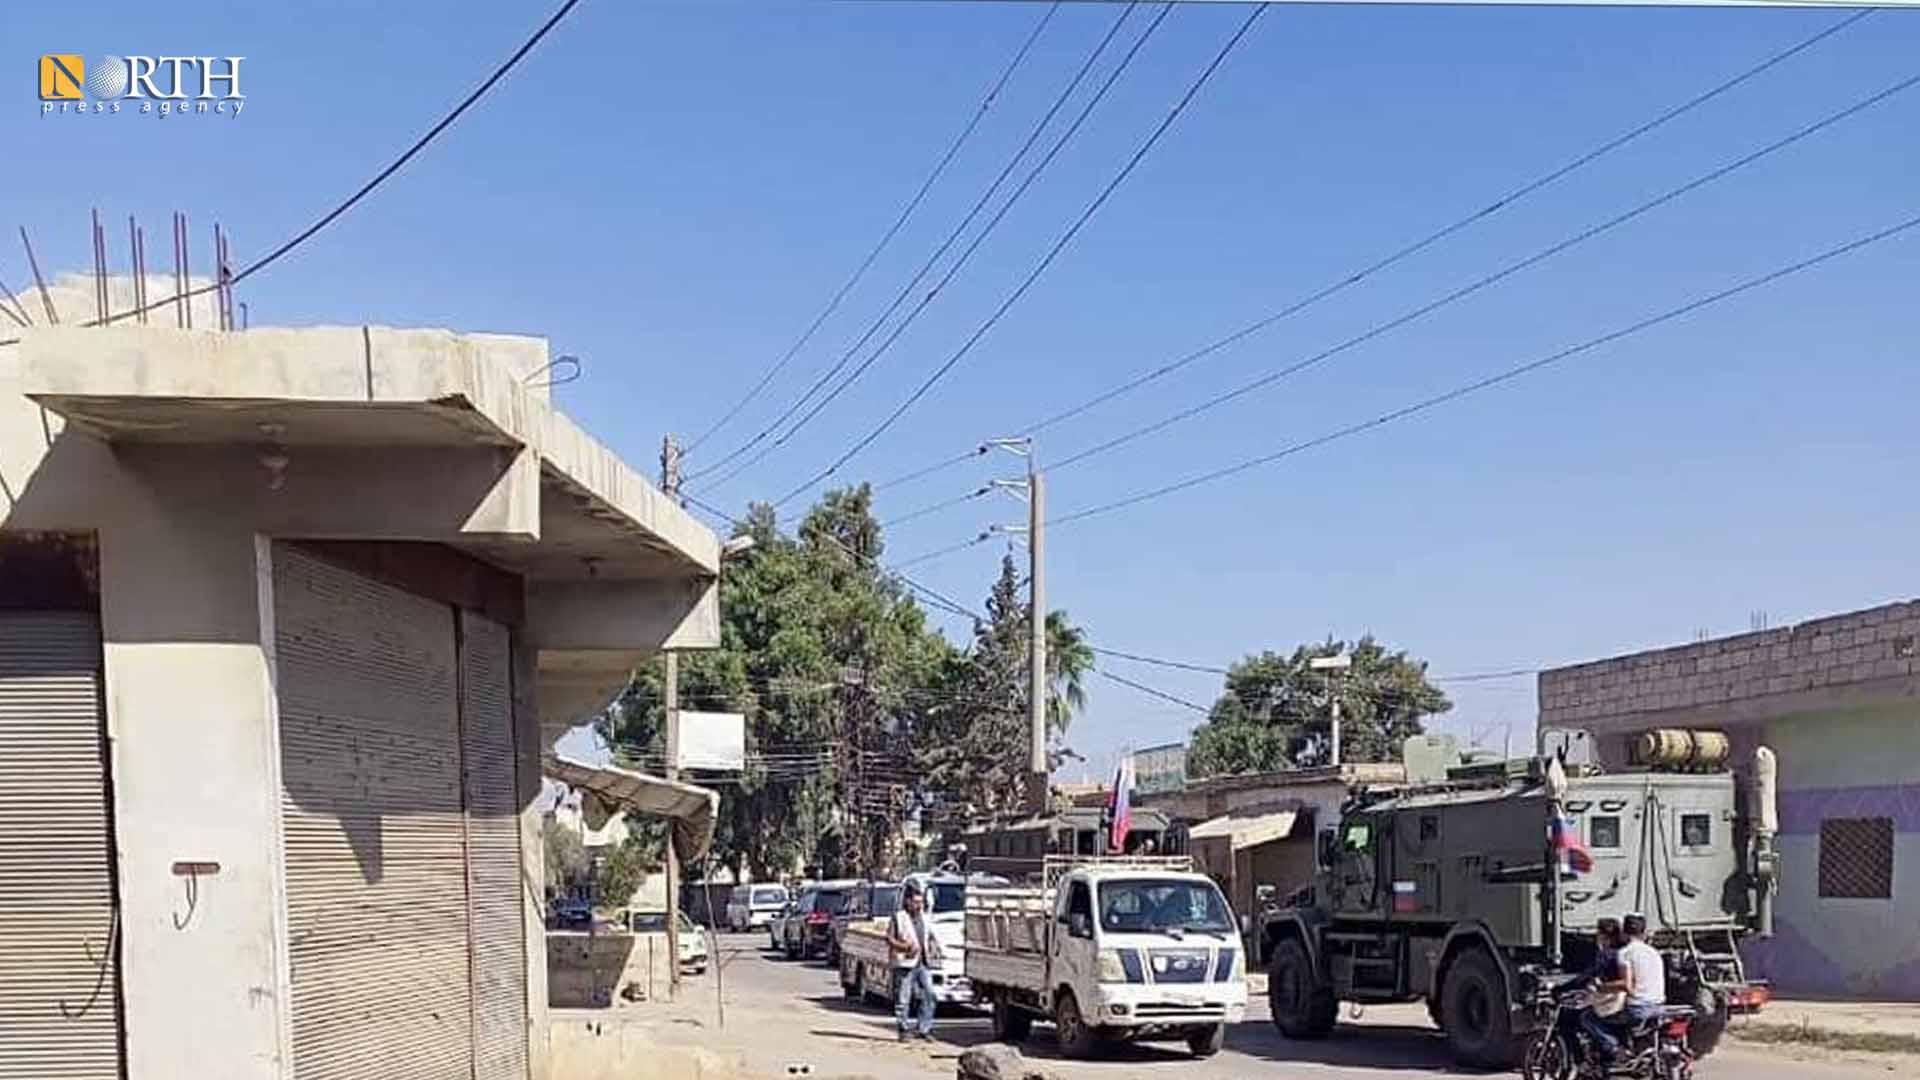 Russian armored vehicles inside Tafas town, Daraa – North Press